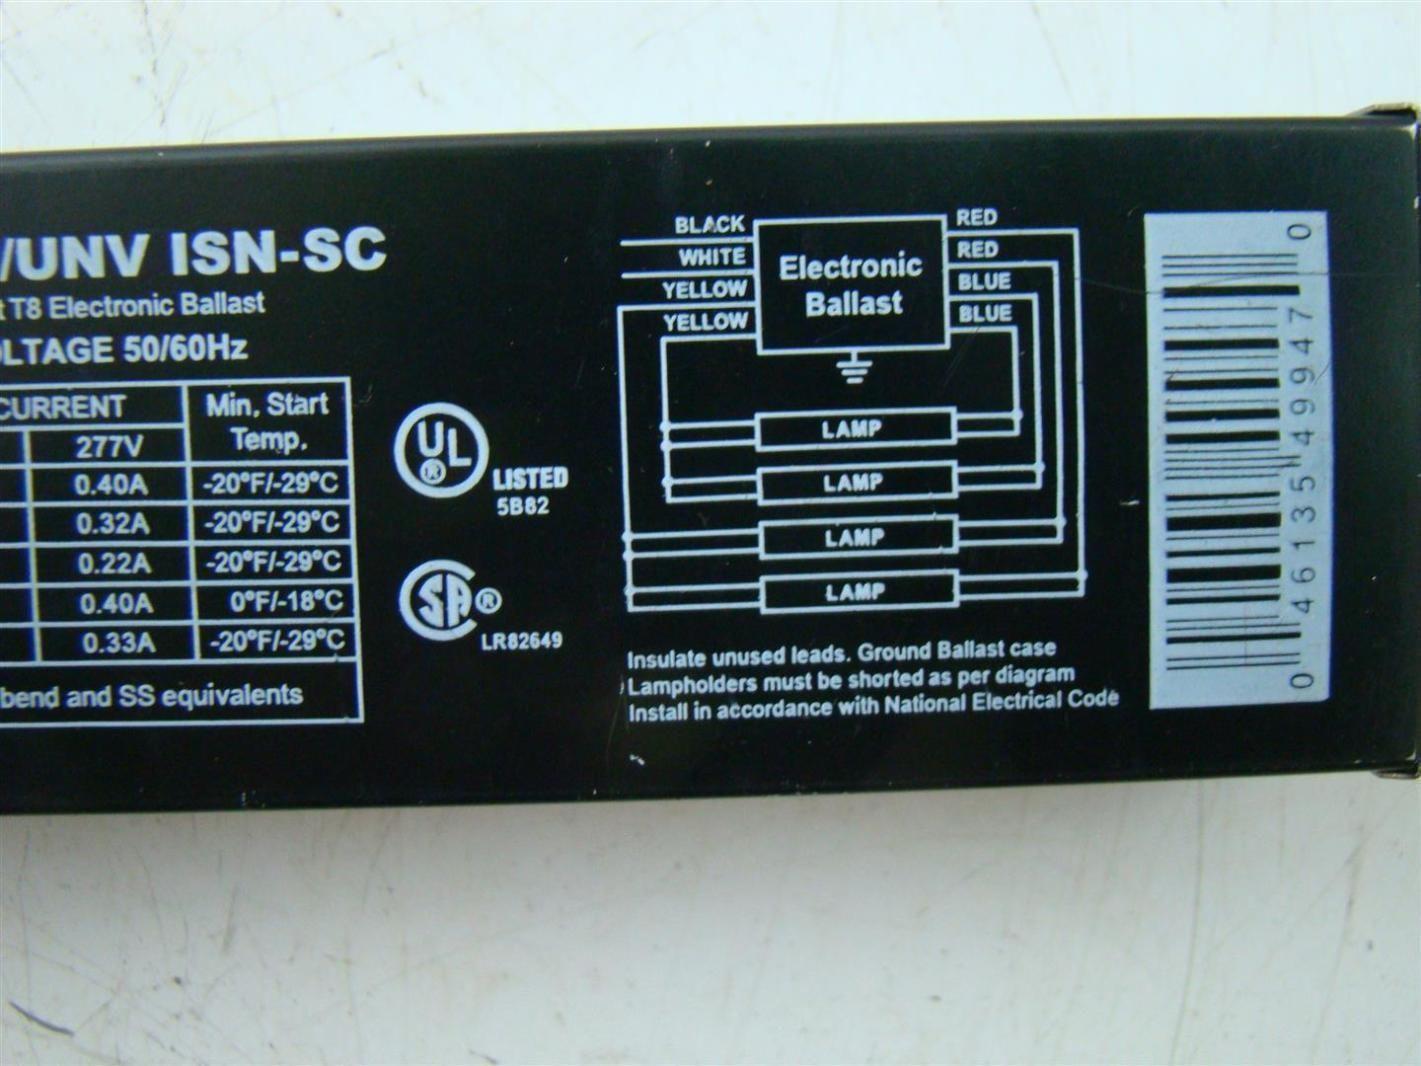 Sylvania Quicktronict8 Ballast 120-277V QTP 4x32T8/UNV ISN-SC on